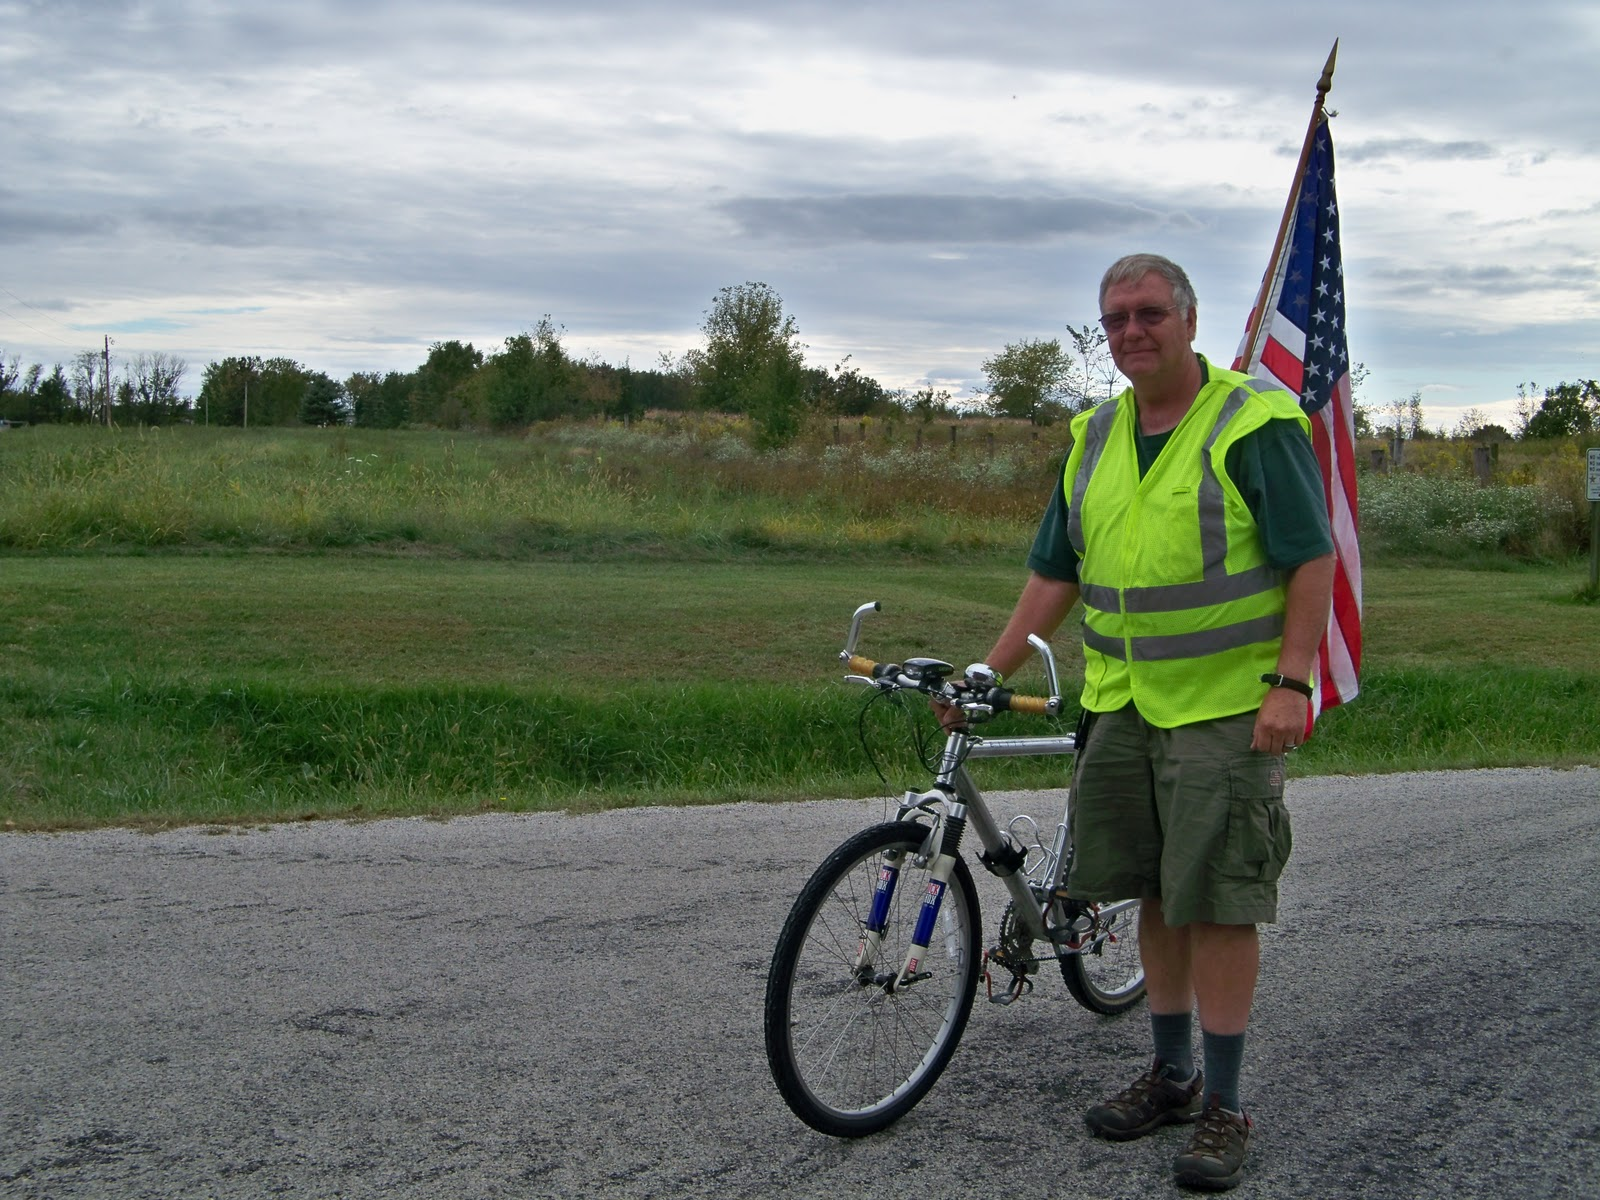 Illinois vermilion county muncie - Illinois Vermilion County Muncie 81